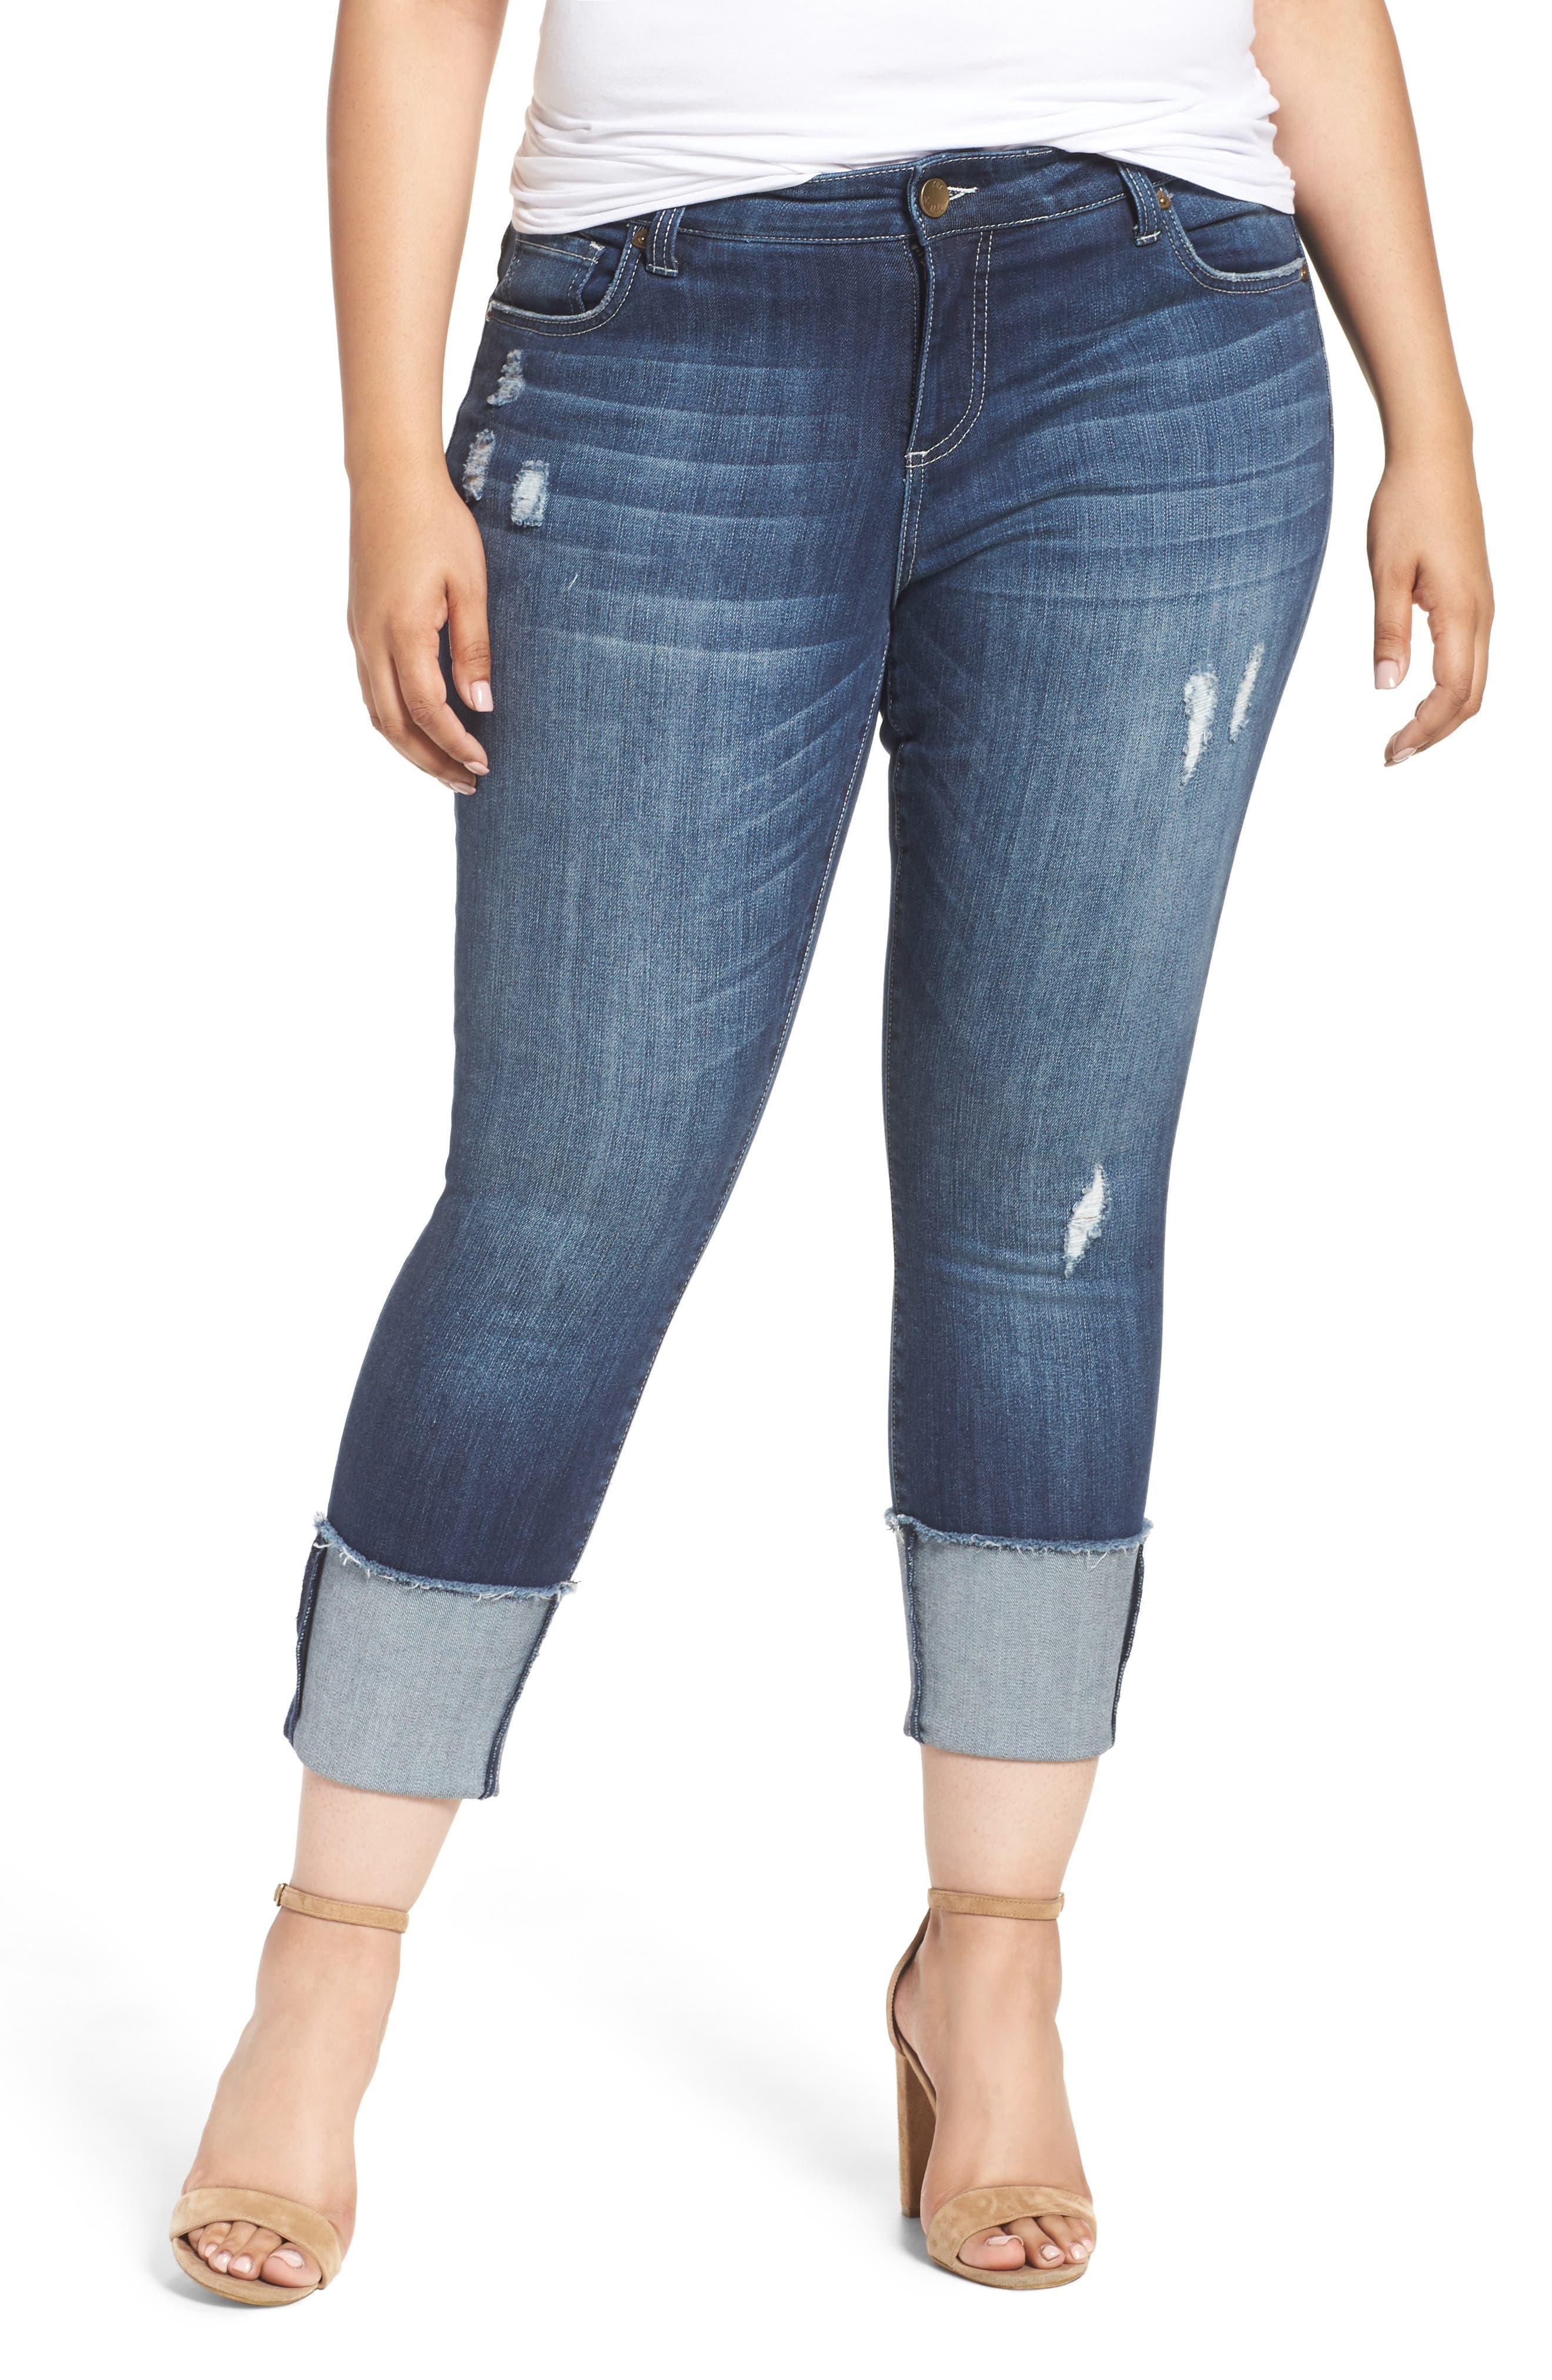 Cameron Cuffed Straight Leg Jeans,                             Main thumbnail 1, color,